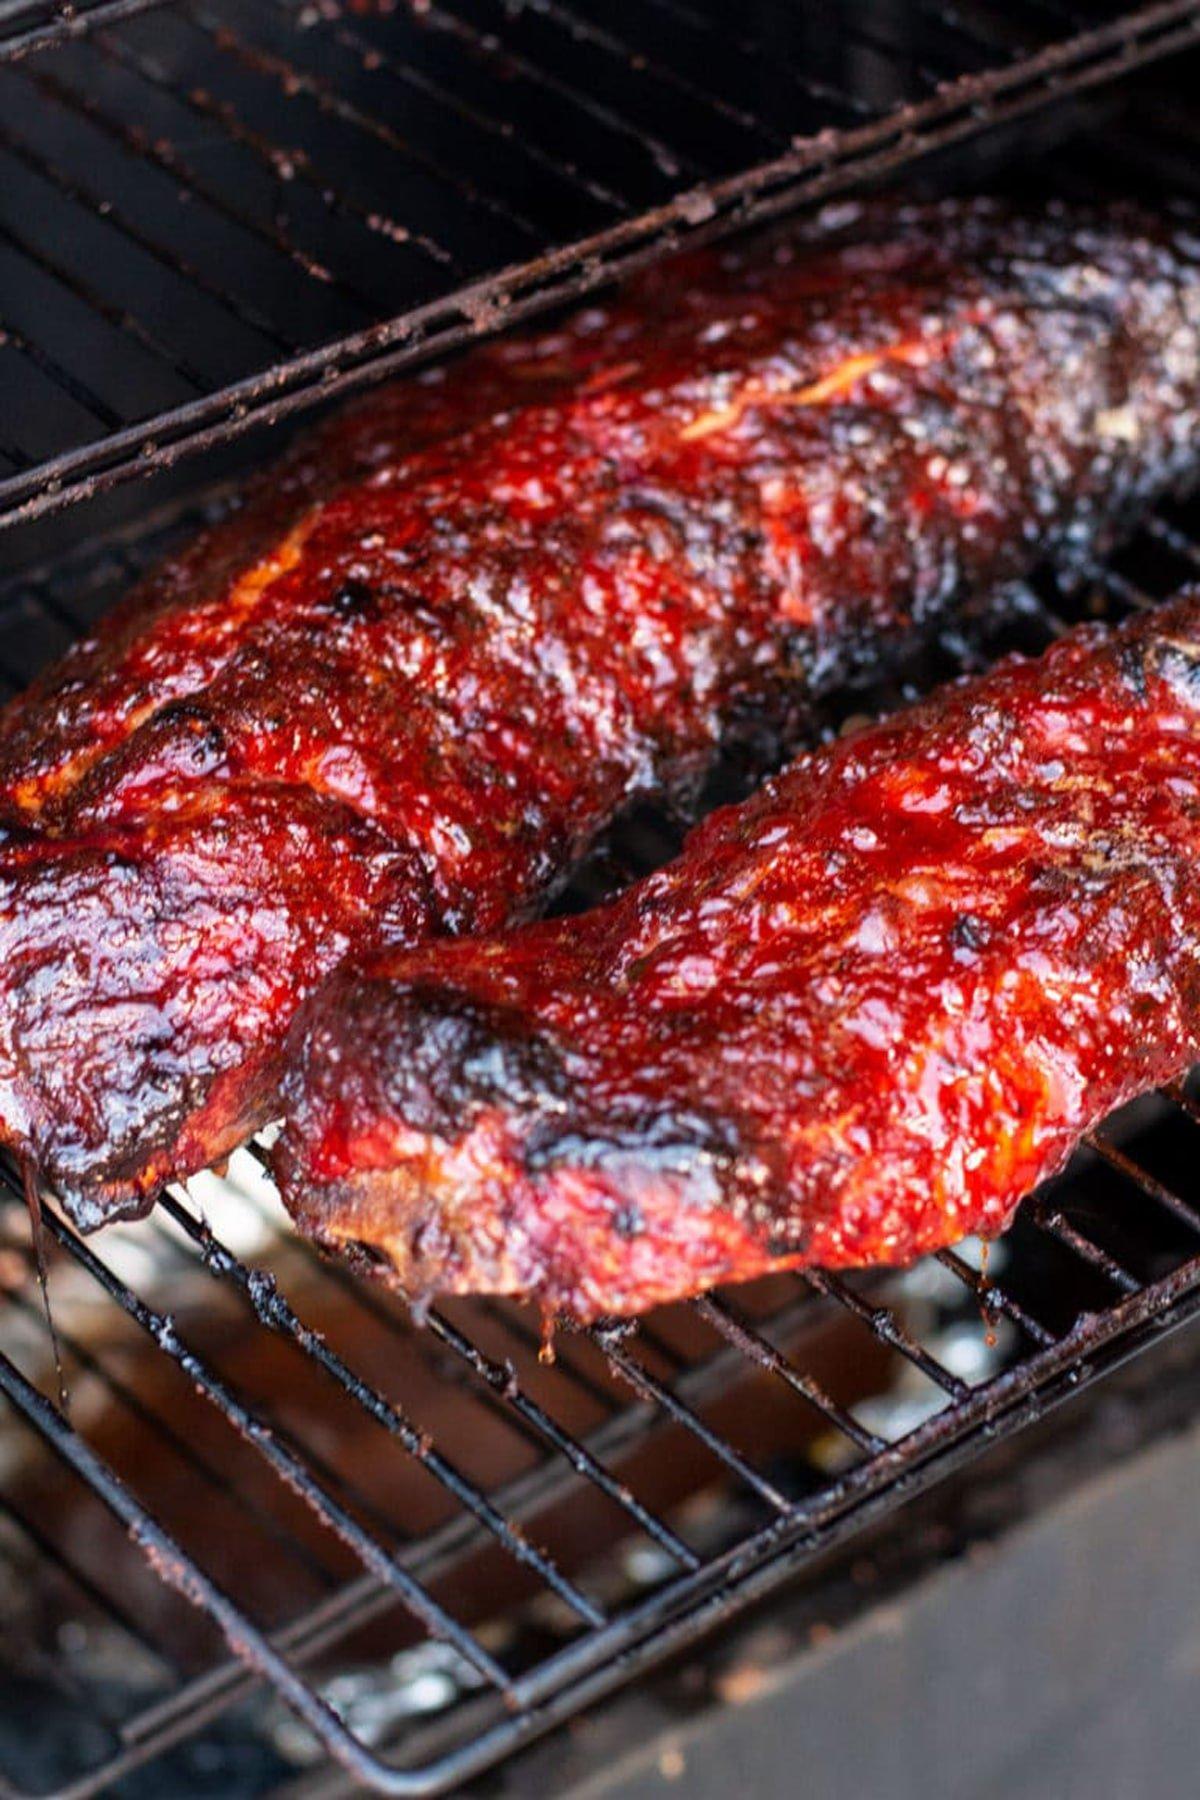 2 slabs of BBQ ribs on a smoker.